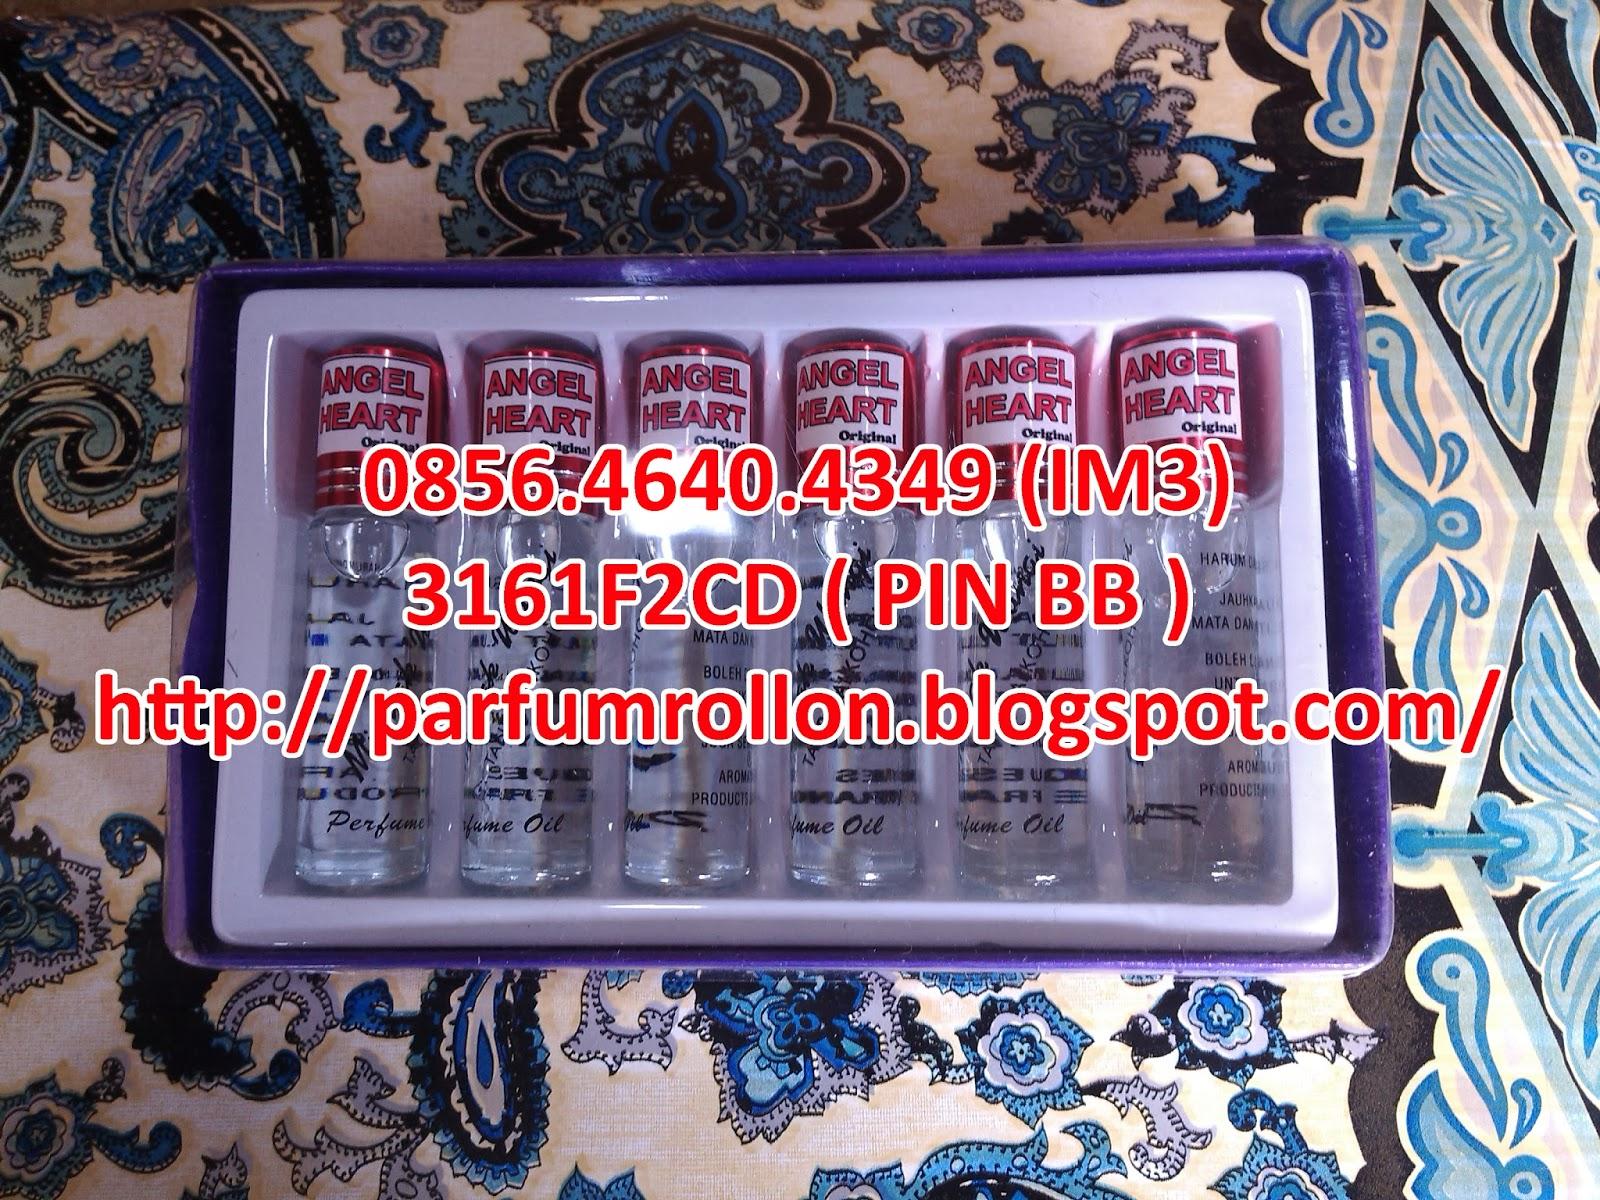 toko parfum online indonesia, parfum online di Indonesia, parfum online indonesia, 0856.4640.4349